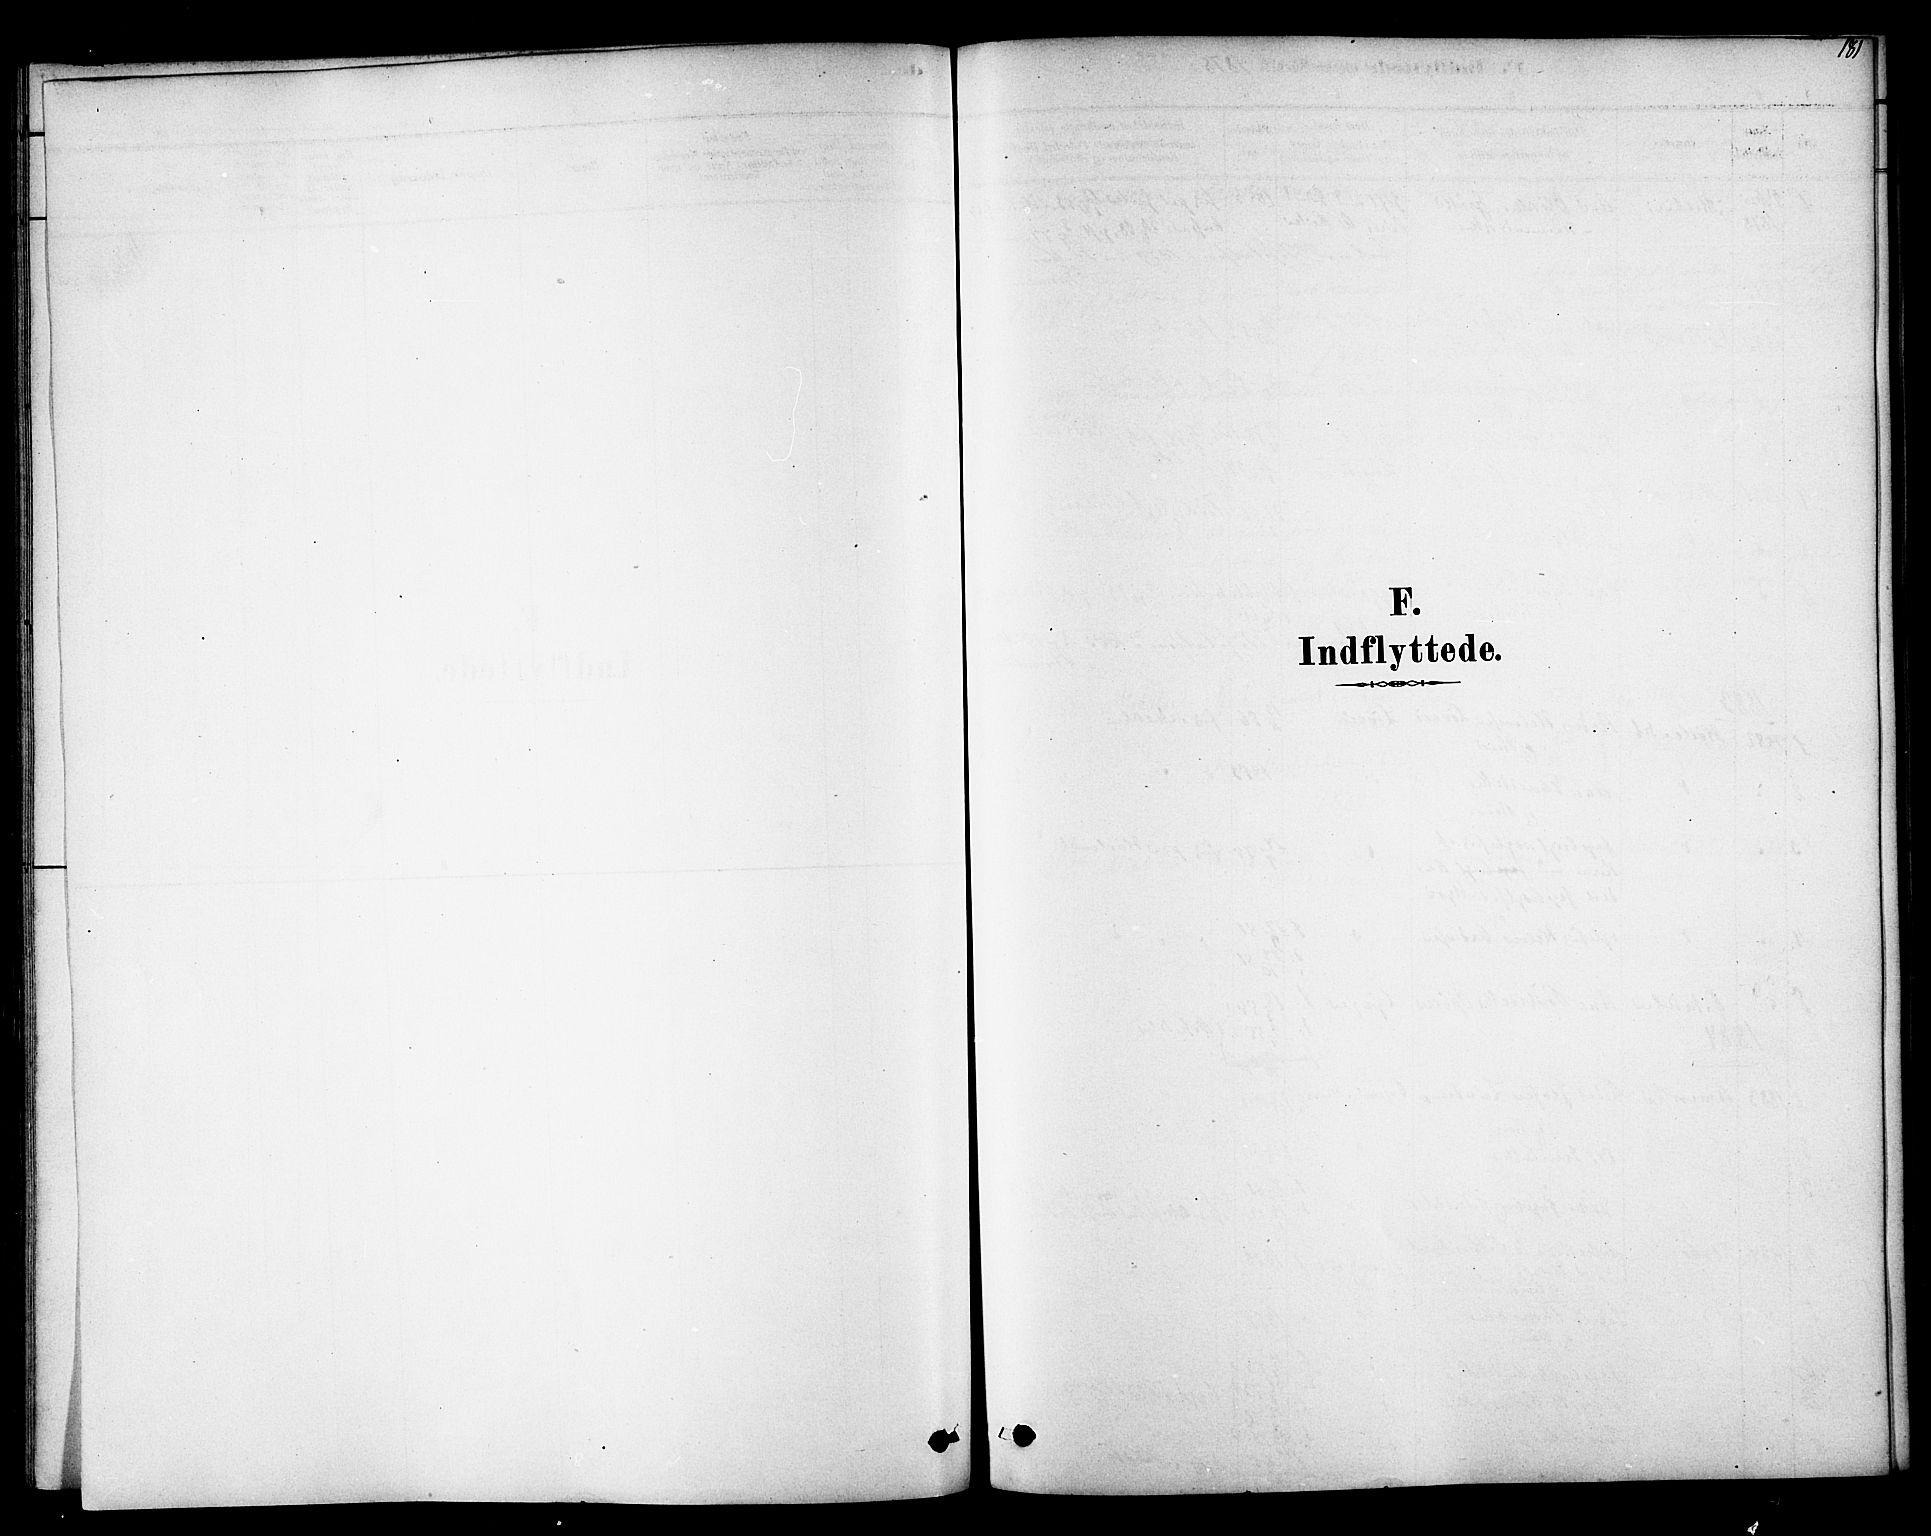 SAT, Ministerialprotokoller, klokkerbøker og fødselsregistre - Sør-Trøndelag, 692/L1105: Parish register (official) no. 692A05, 1878-1890, p. 181